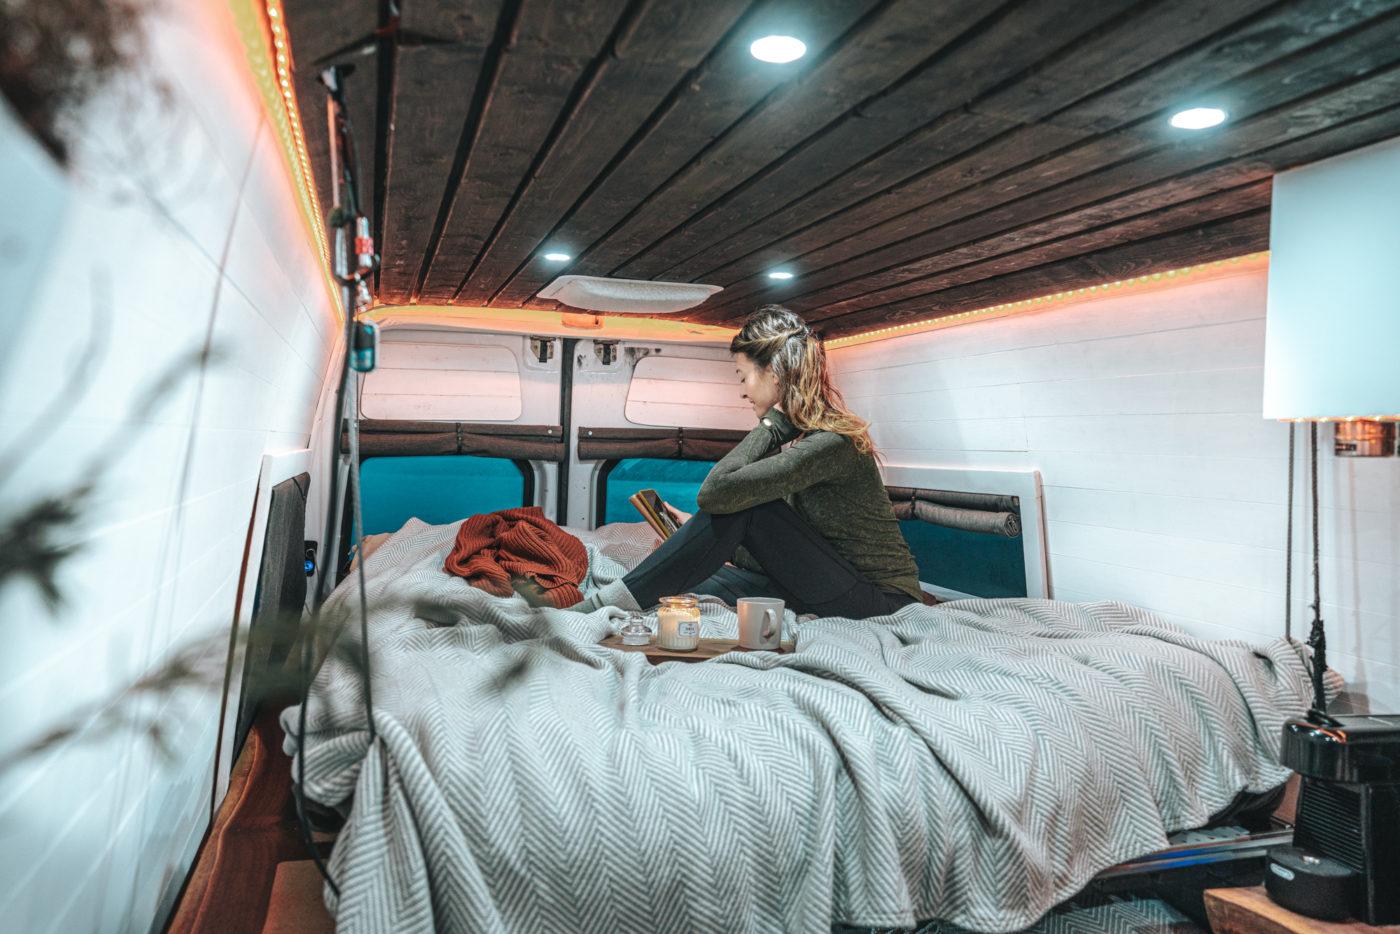 Canada van life bed relaxing candle blanket Oksana-09683